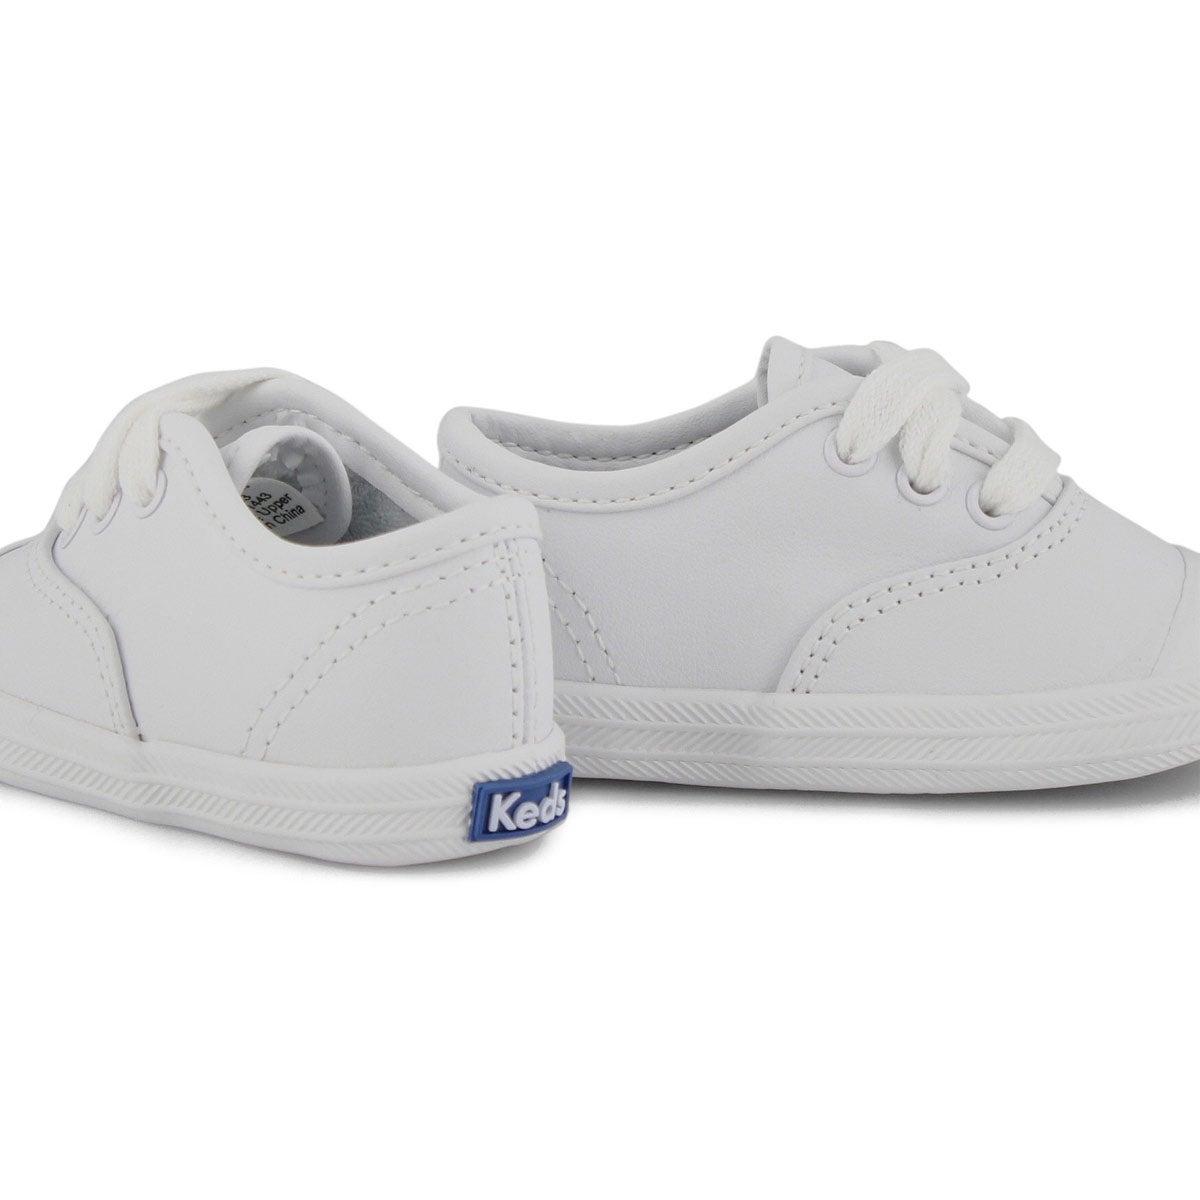 Infants' CHAMPION LACE TOE CAP white sneakers